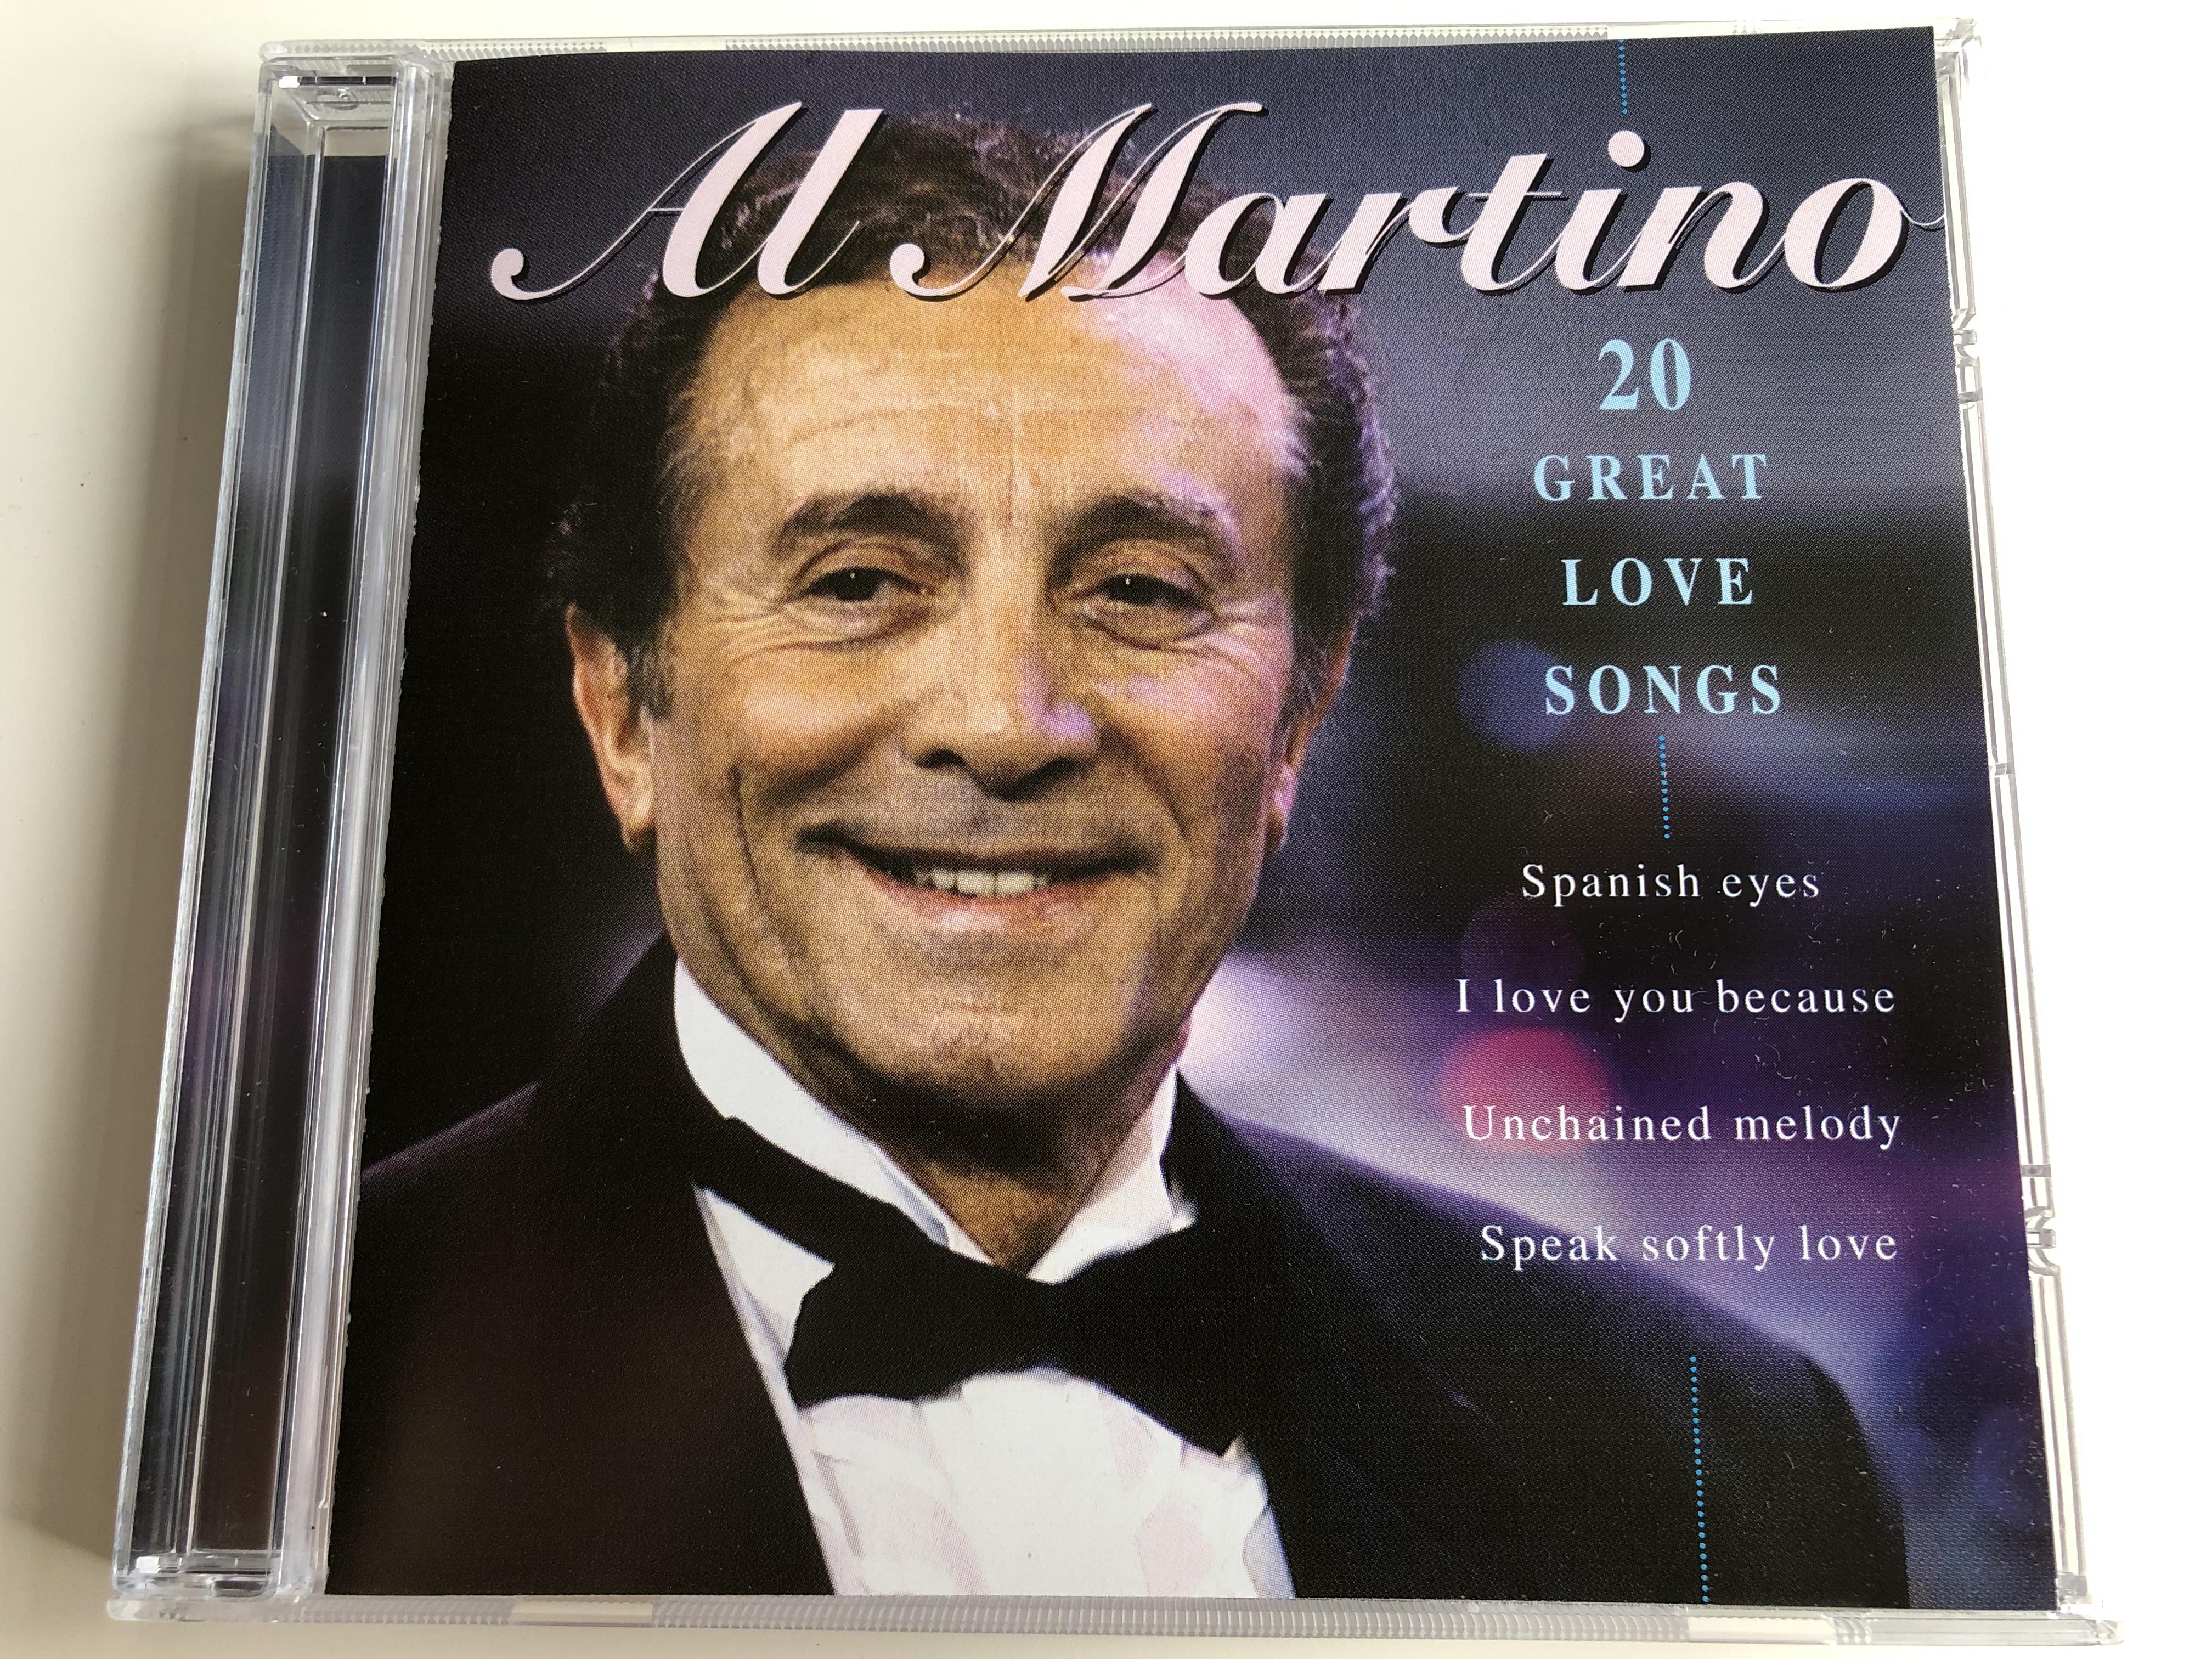 al-martino-20-great-love-songsimg-3975.jpg